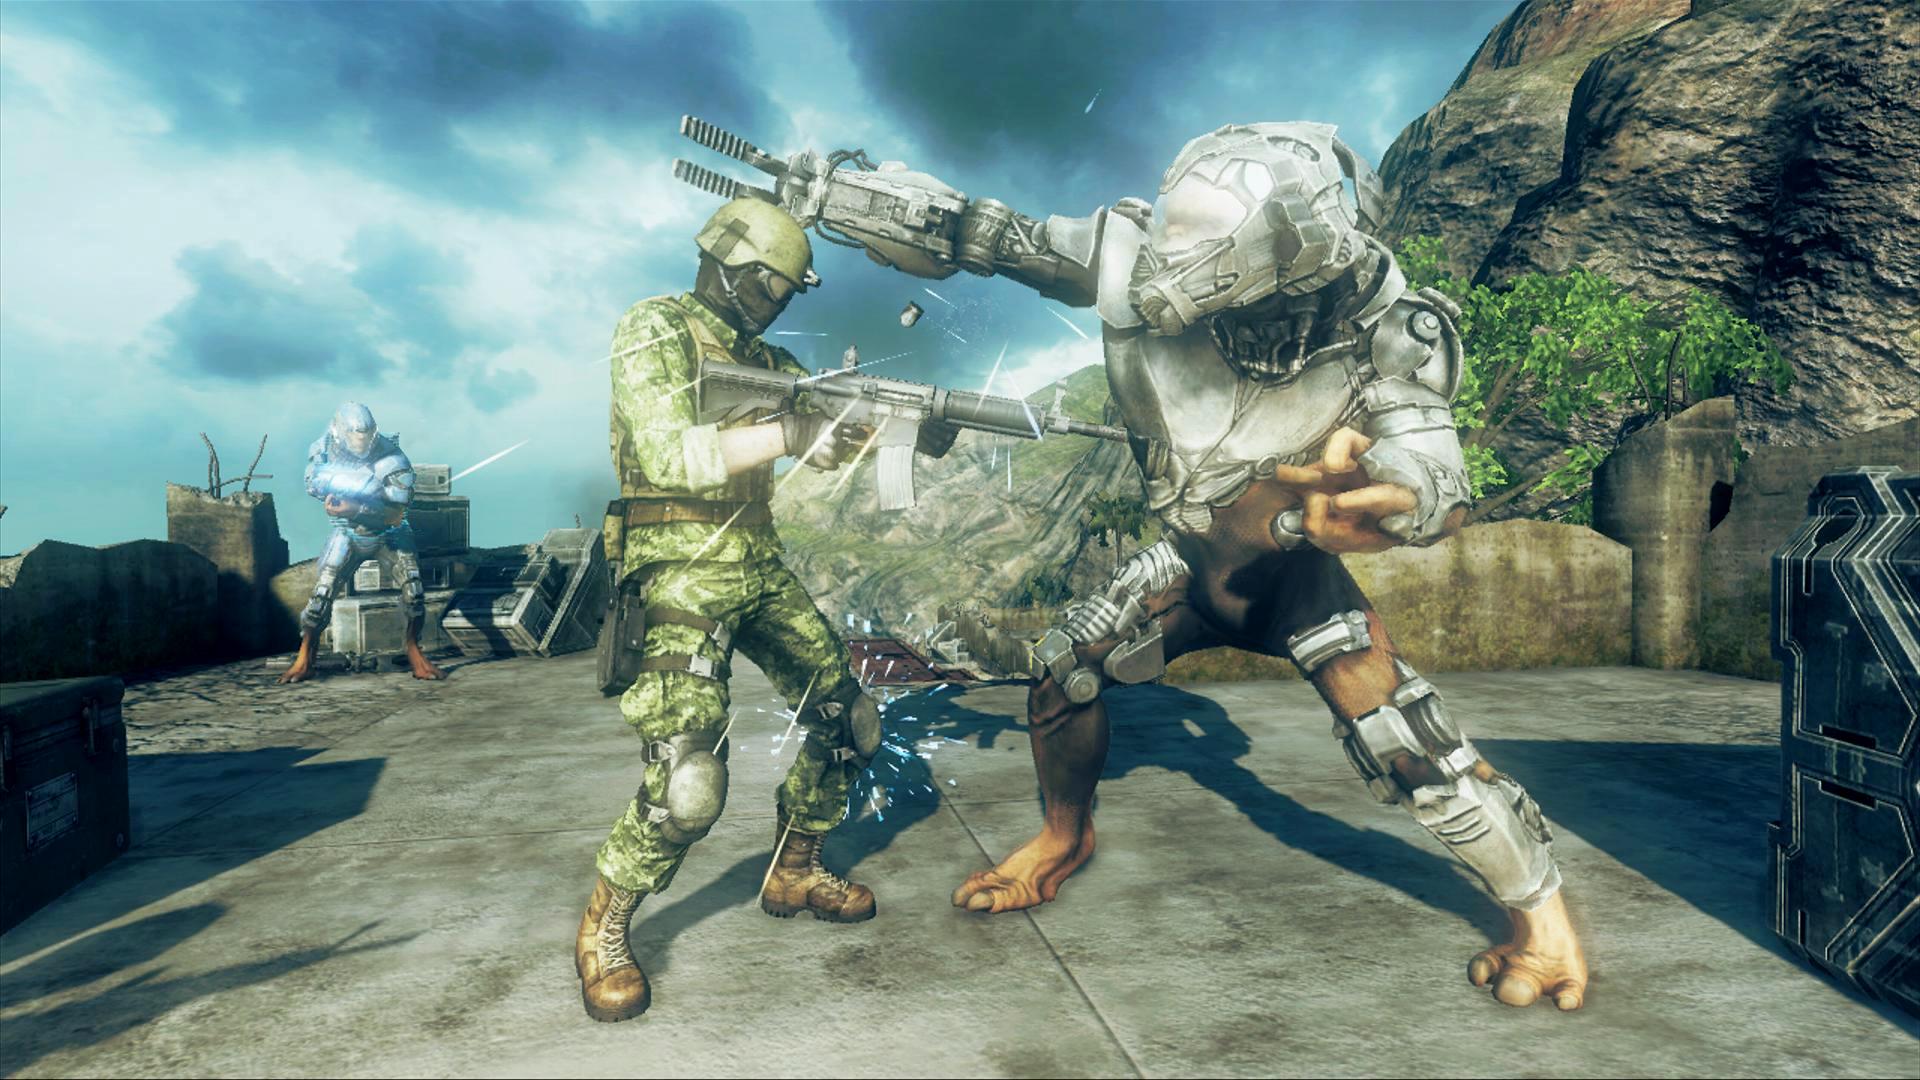 Original Xbox Game Ship : Battleship screenshots video game news videos and file